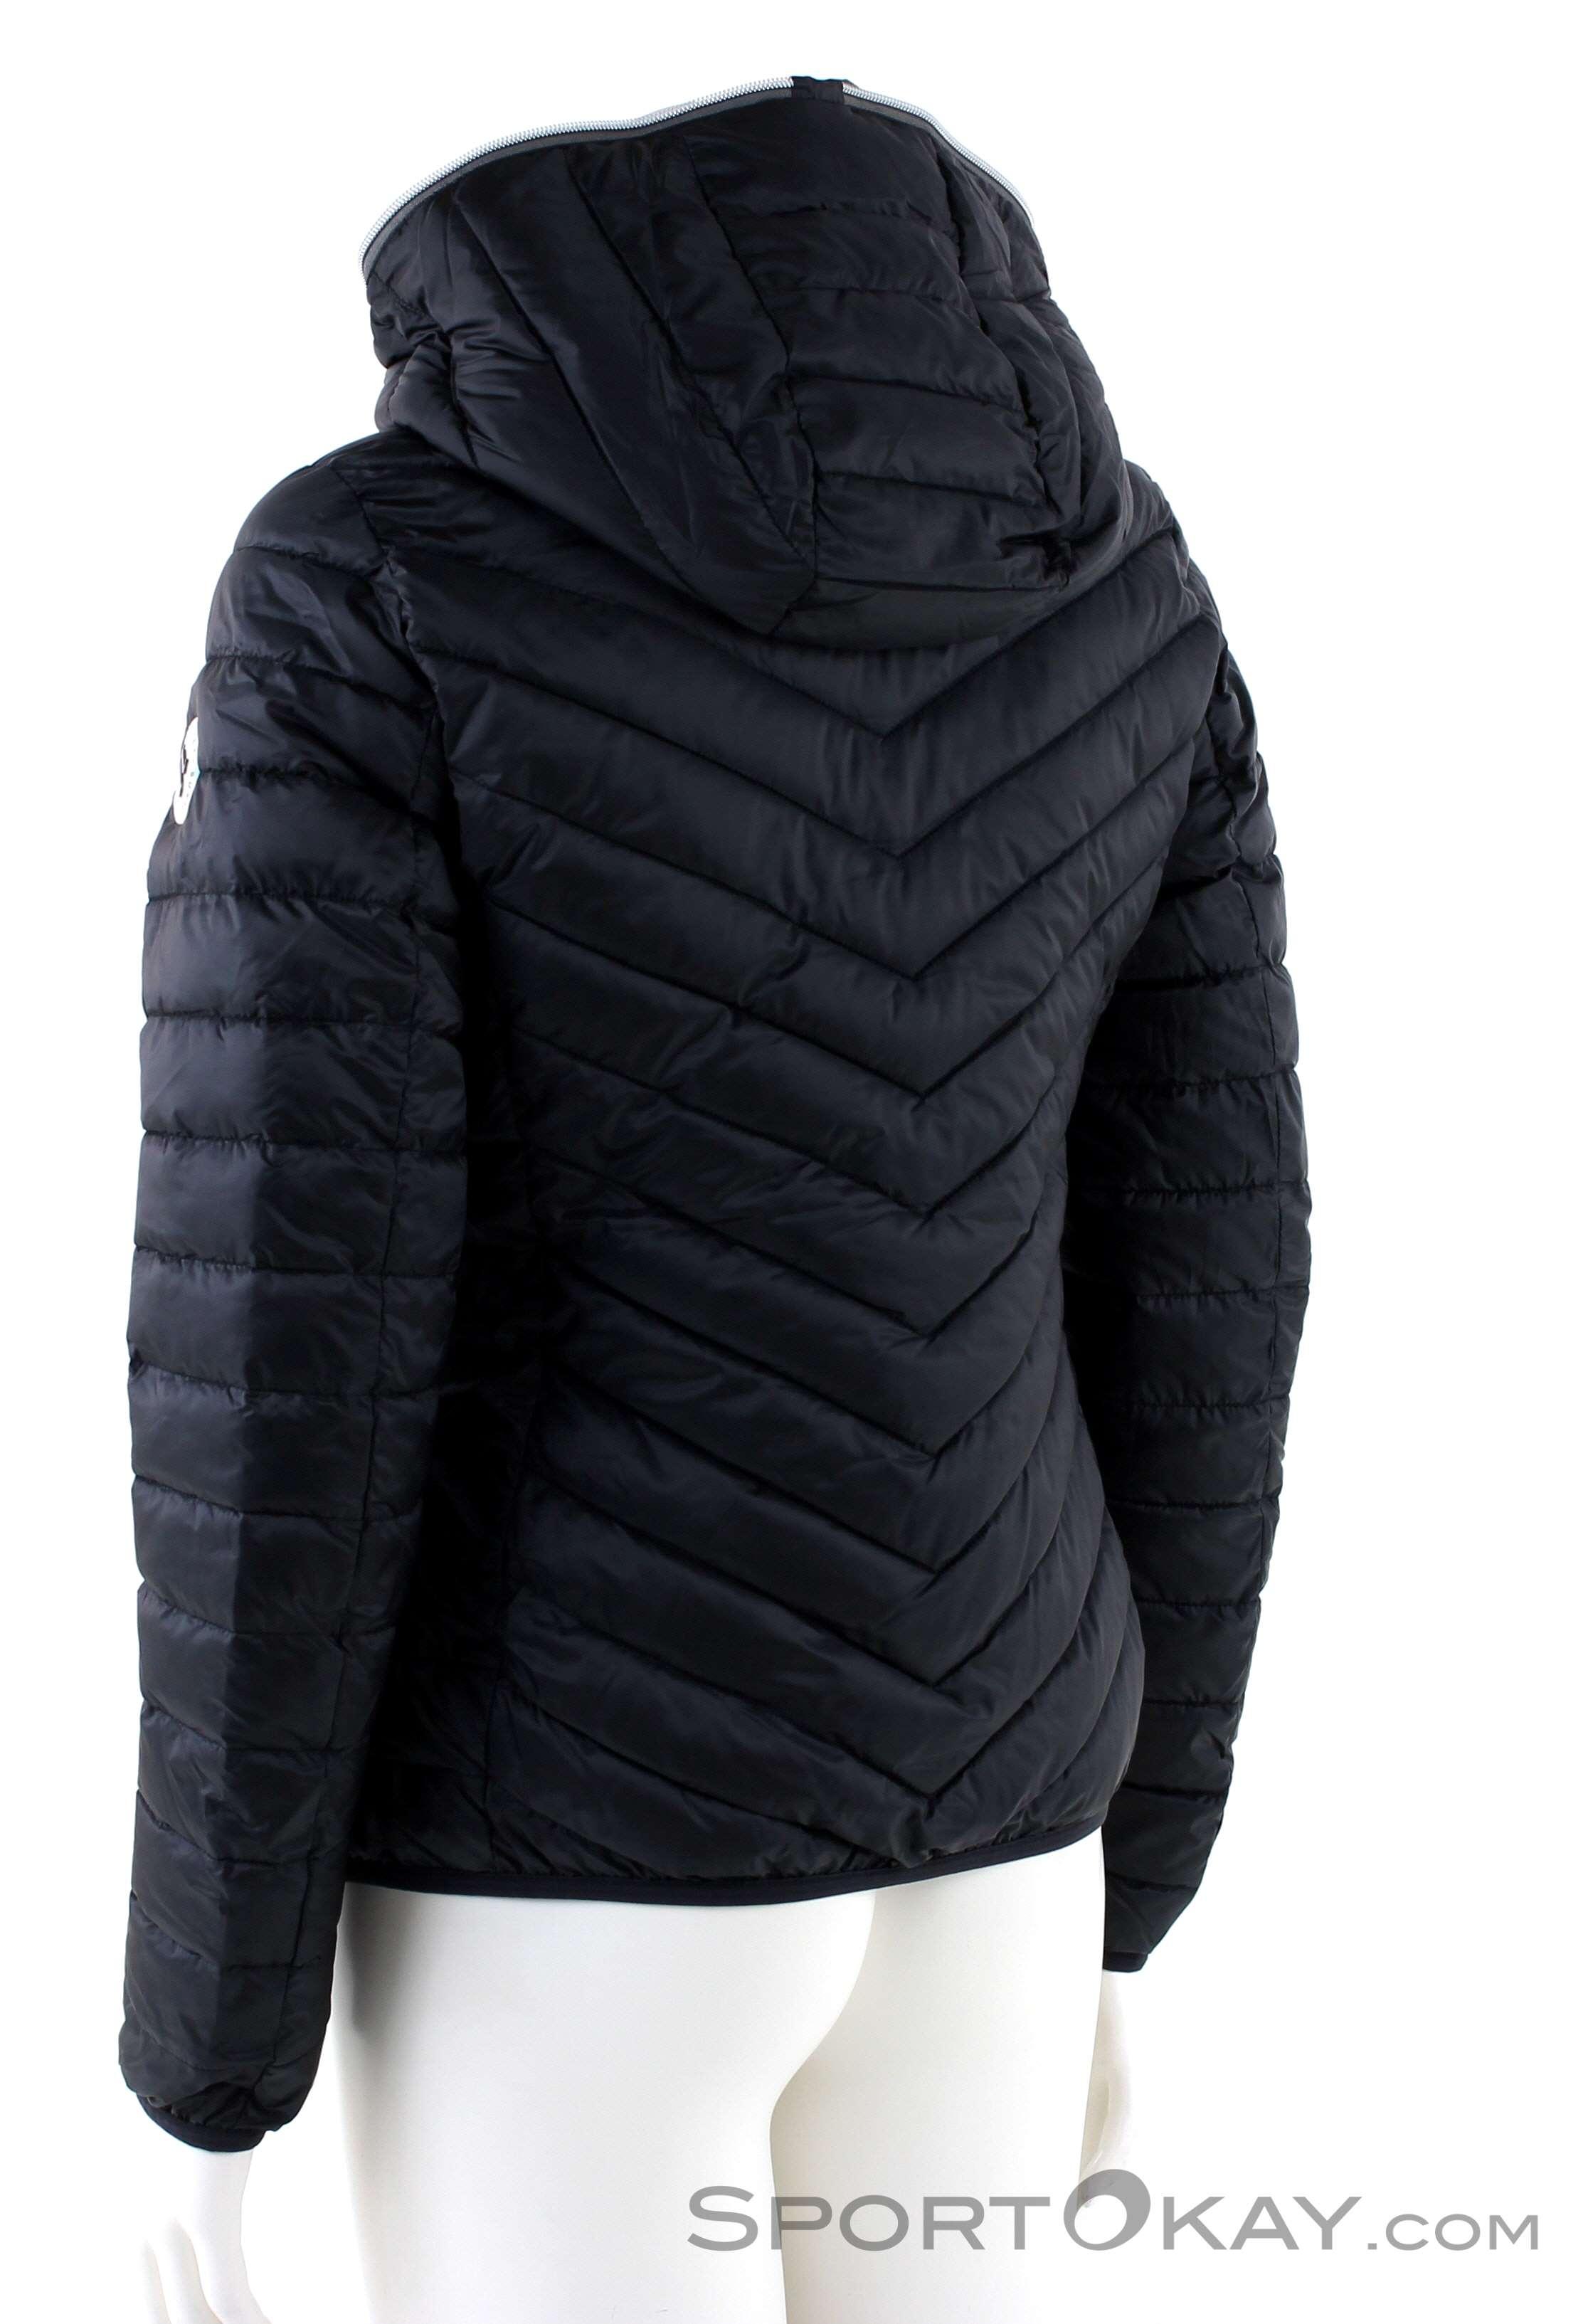 Sun Valley Avenel Jacket Damen Outdoorjacke - Jacken ... 347dcb0df86